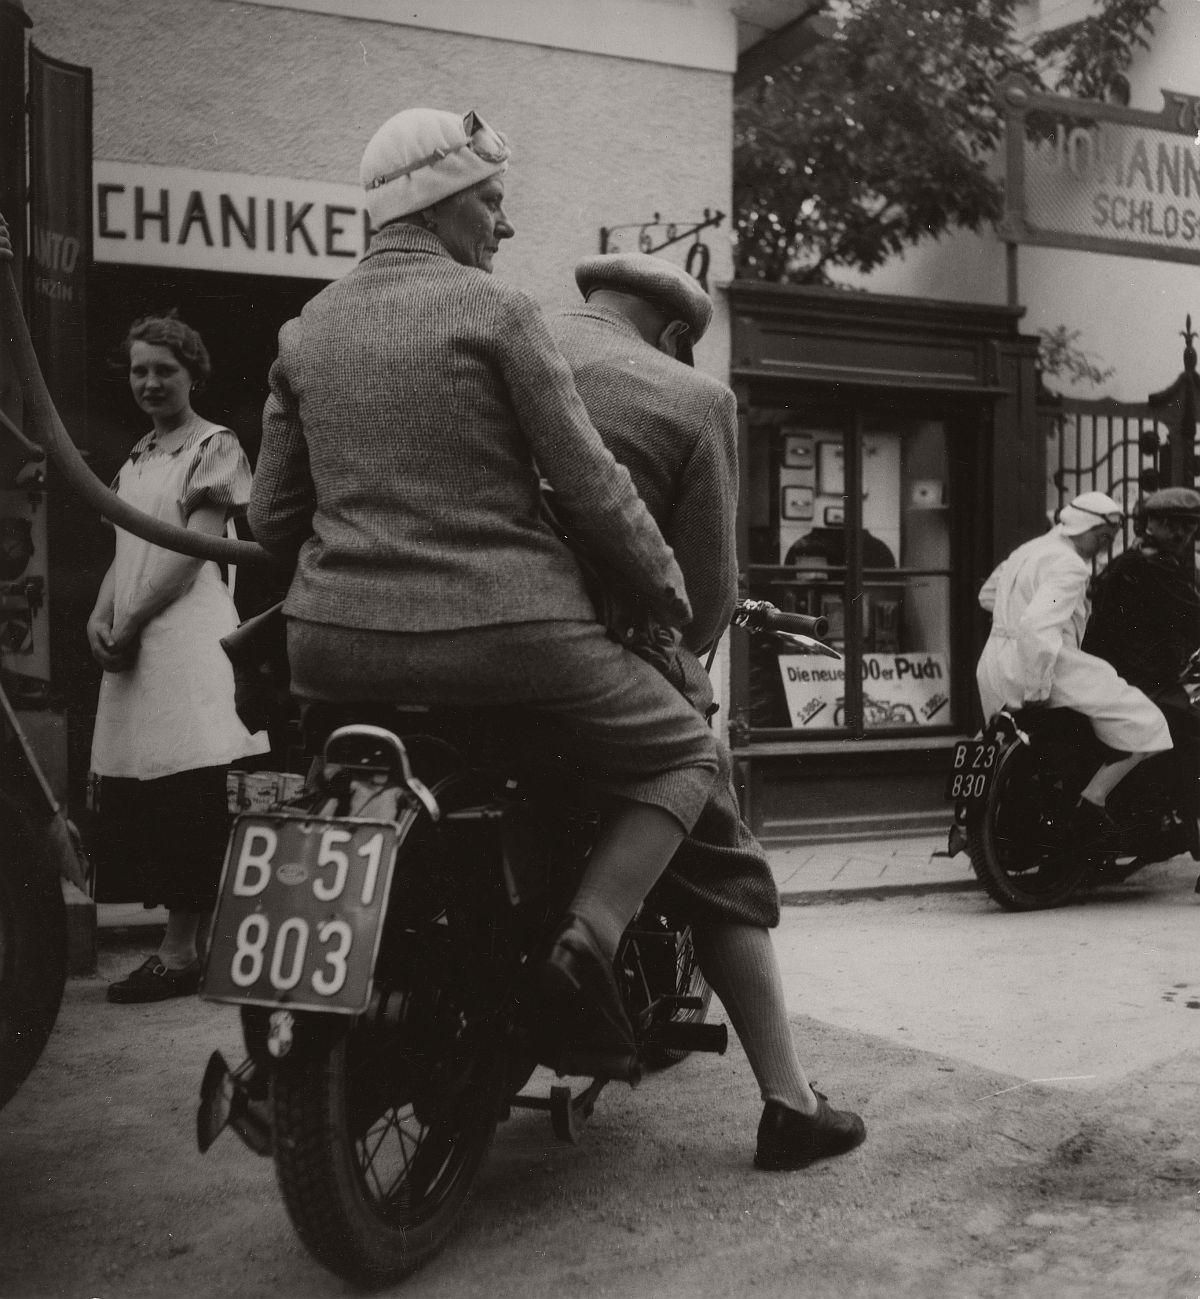 Robert Haas: On a motorcycle, Burgenland, 1937 © Wien Museum/Sammlung Robert Haas